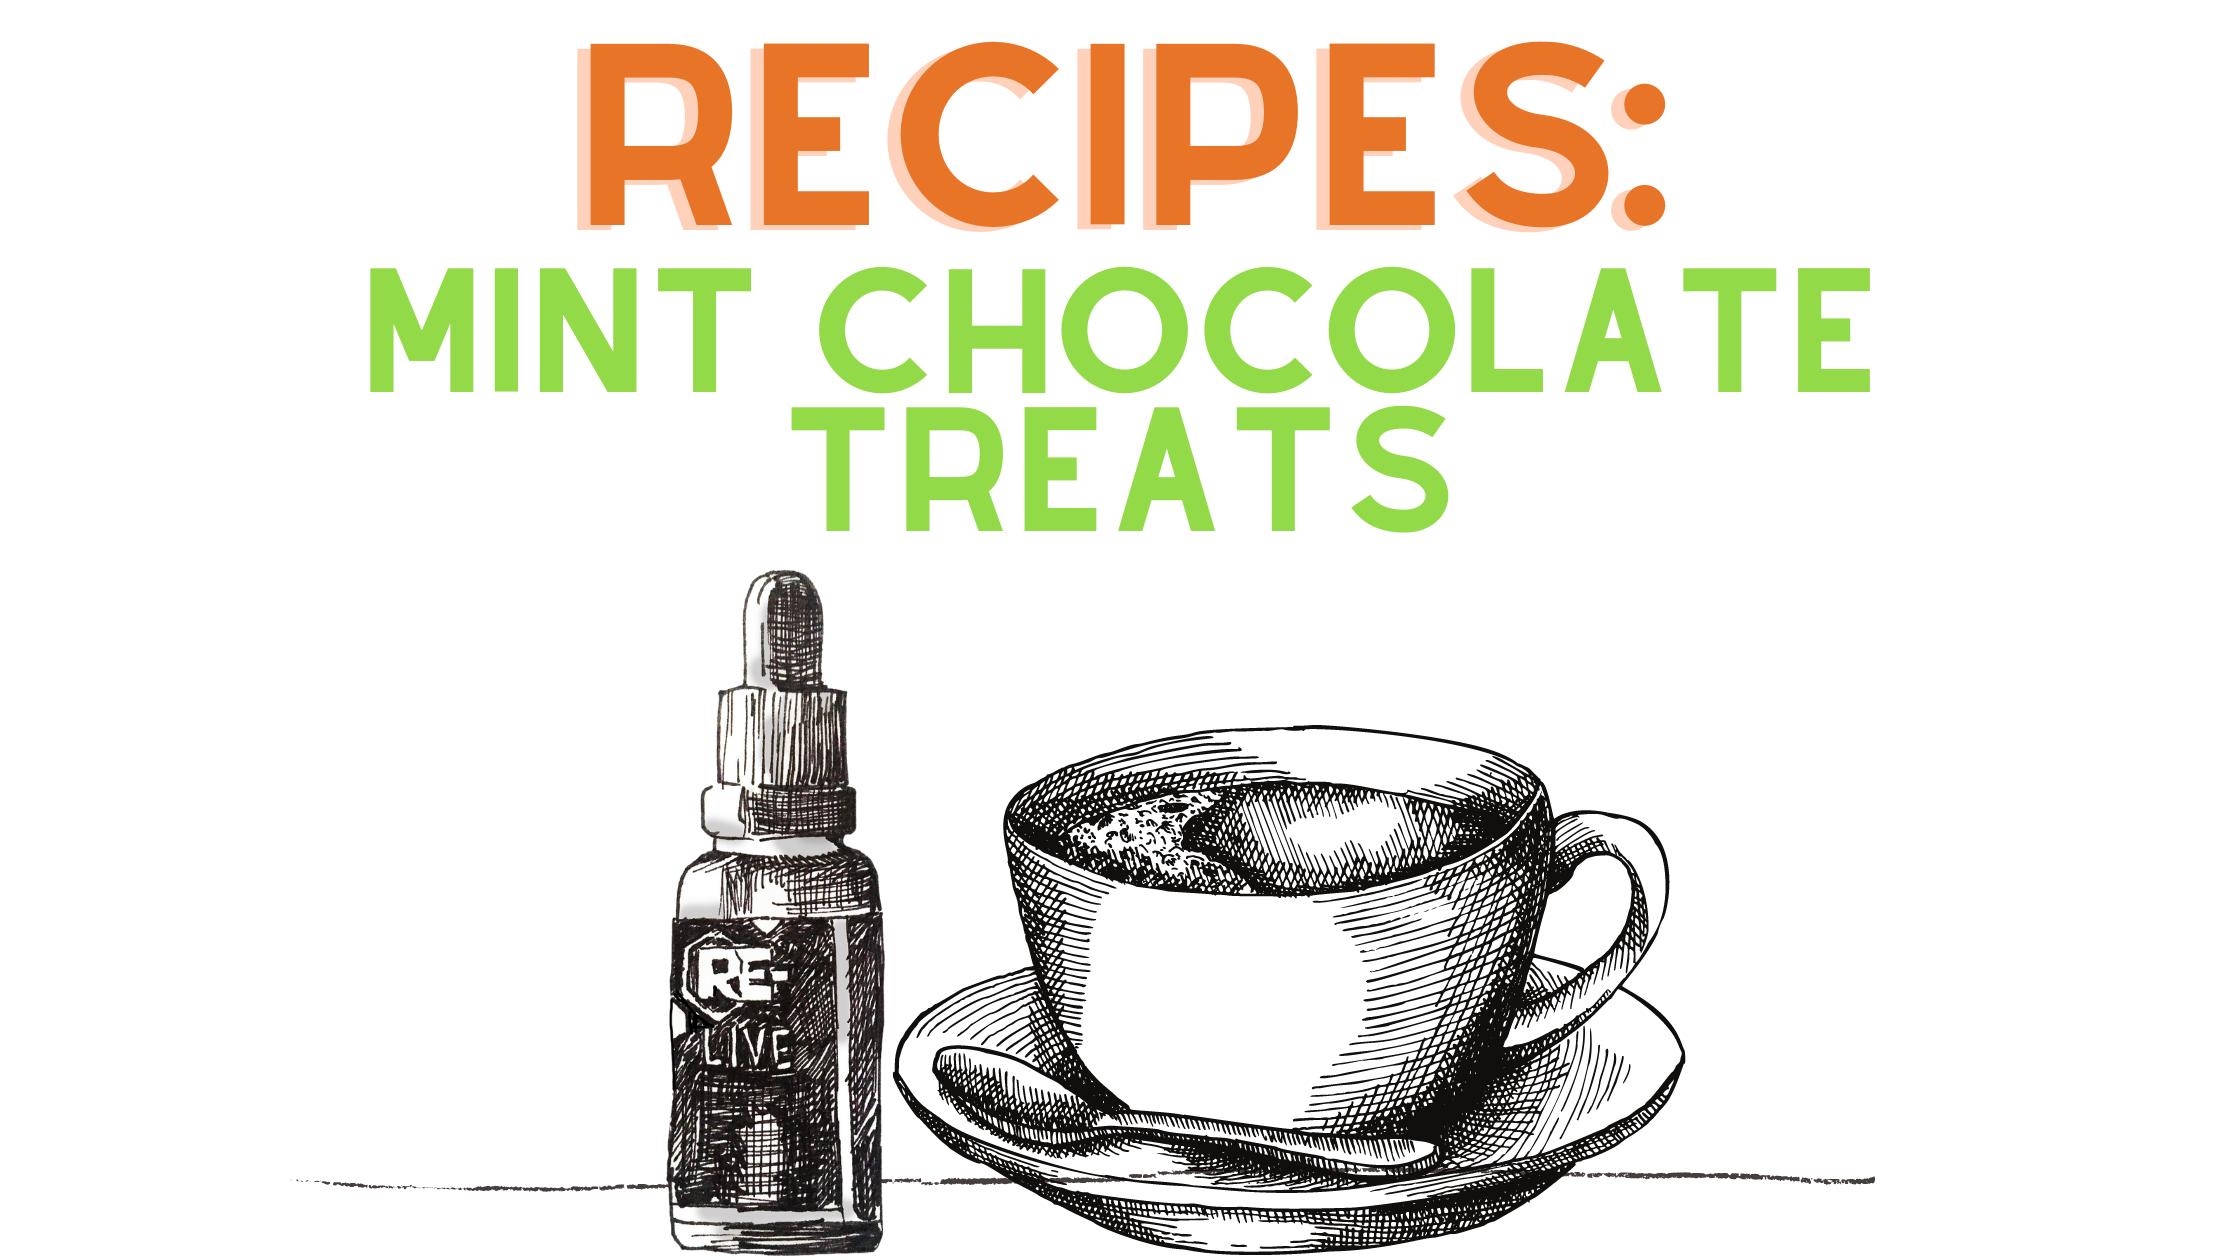 RECIPES MINT CHOCOLATE TREATS Blog Banner